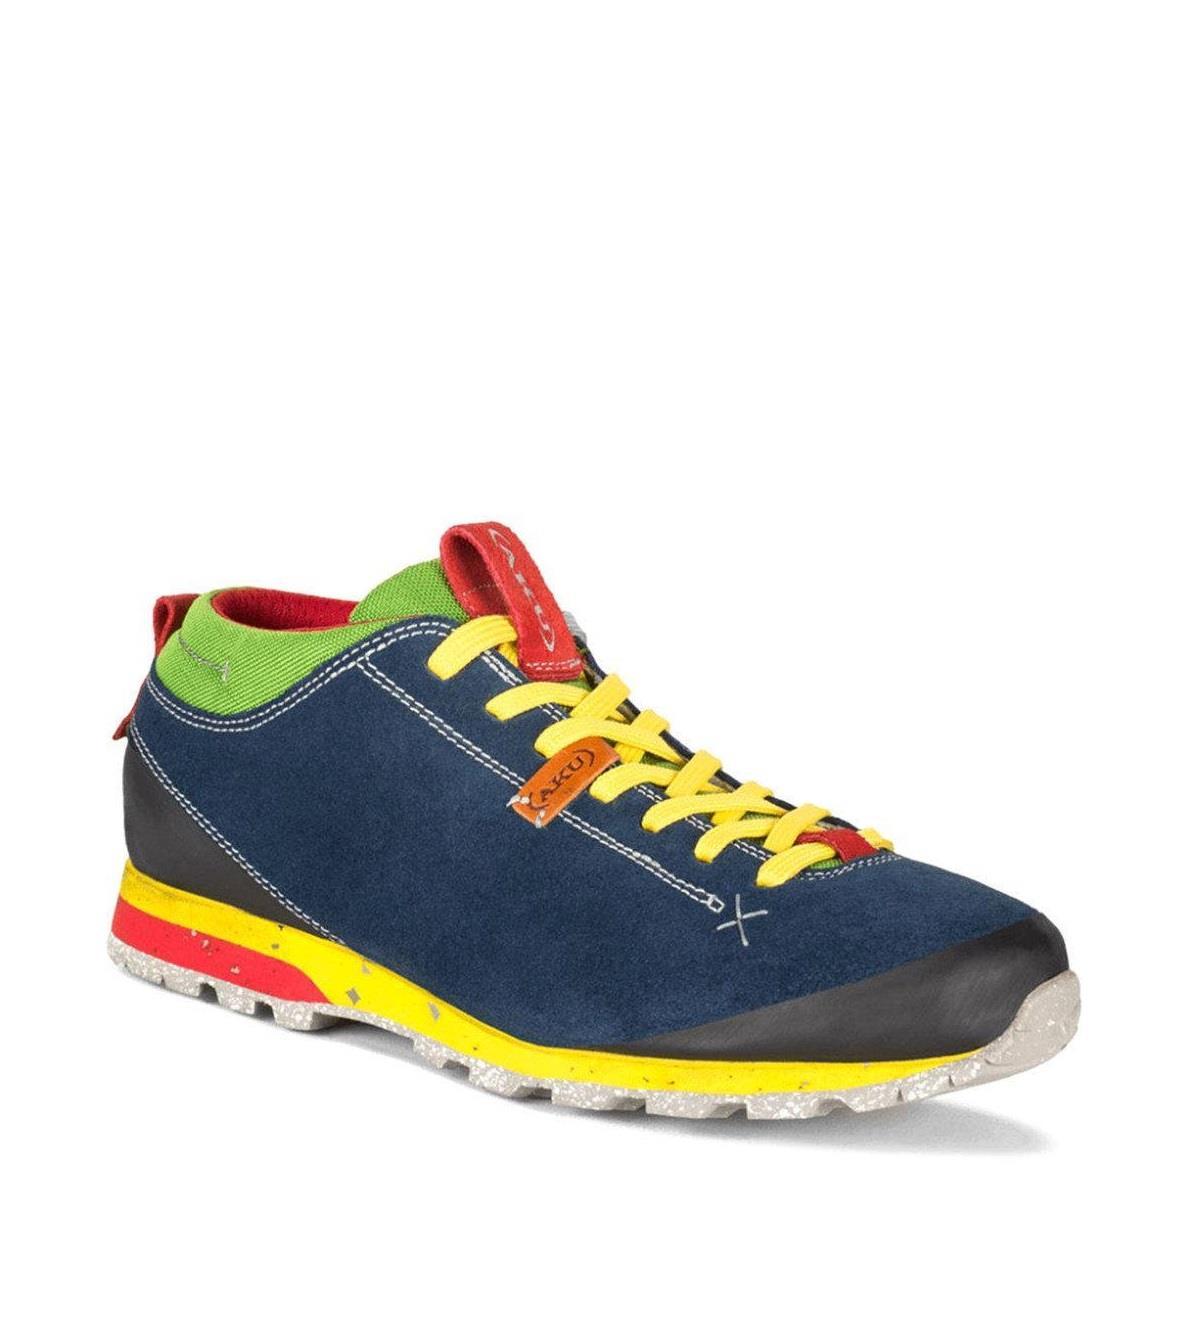 Aku Bellamont Suede Erkek Ayakkabı A506001